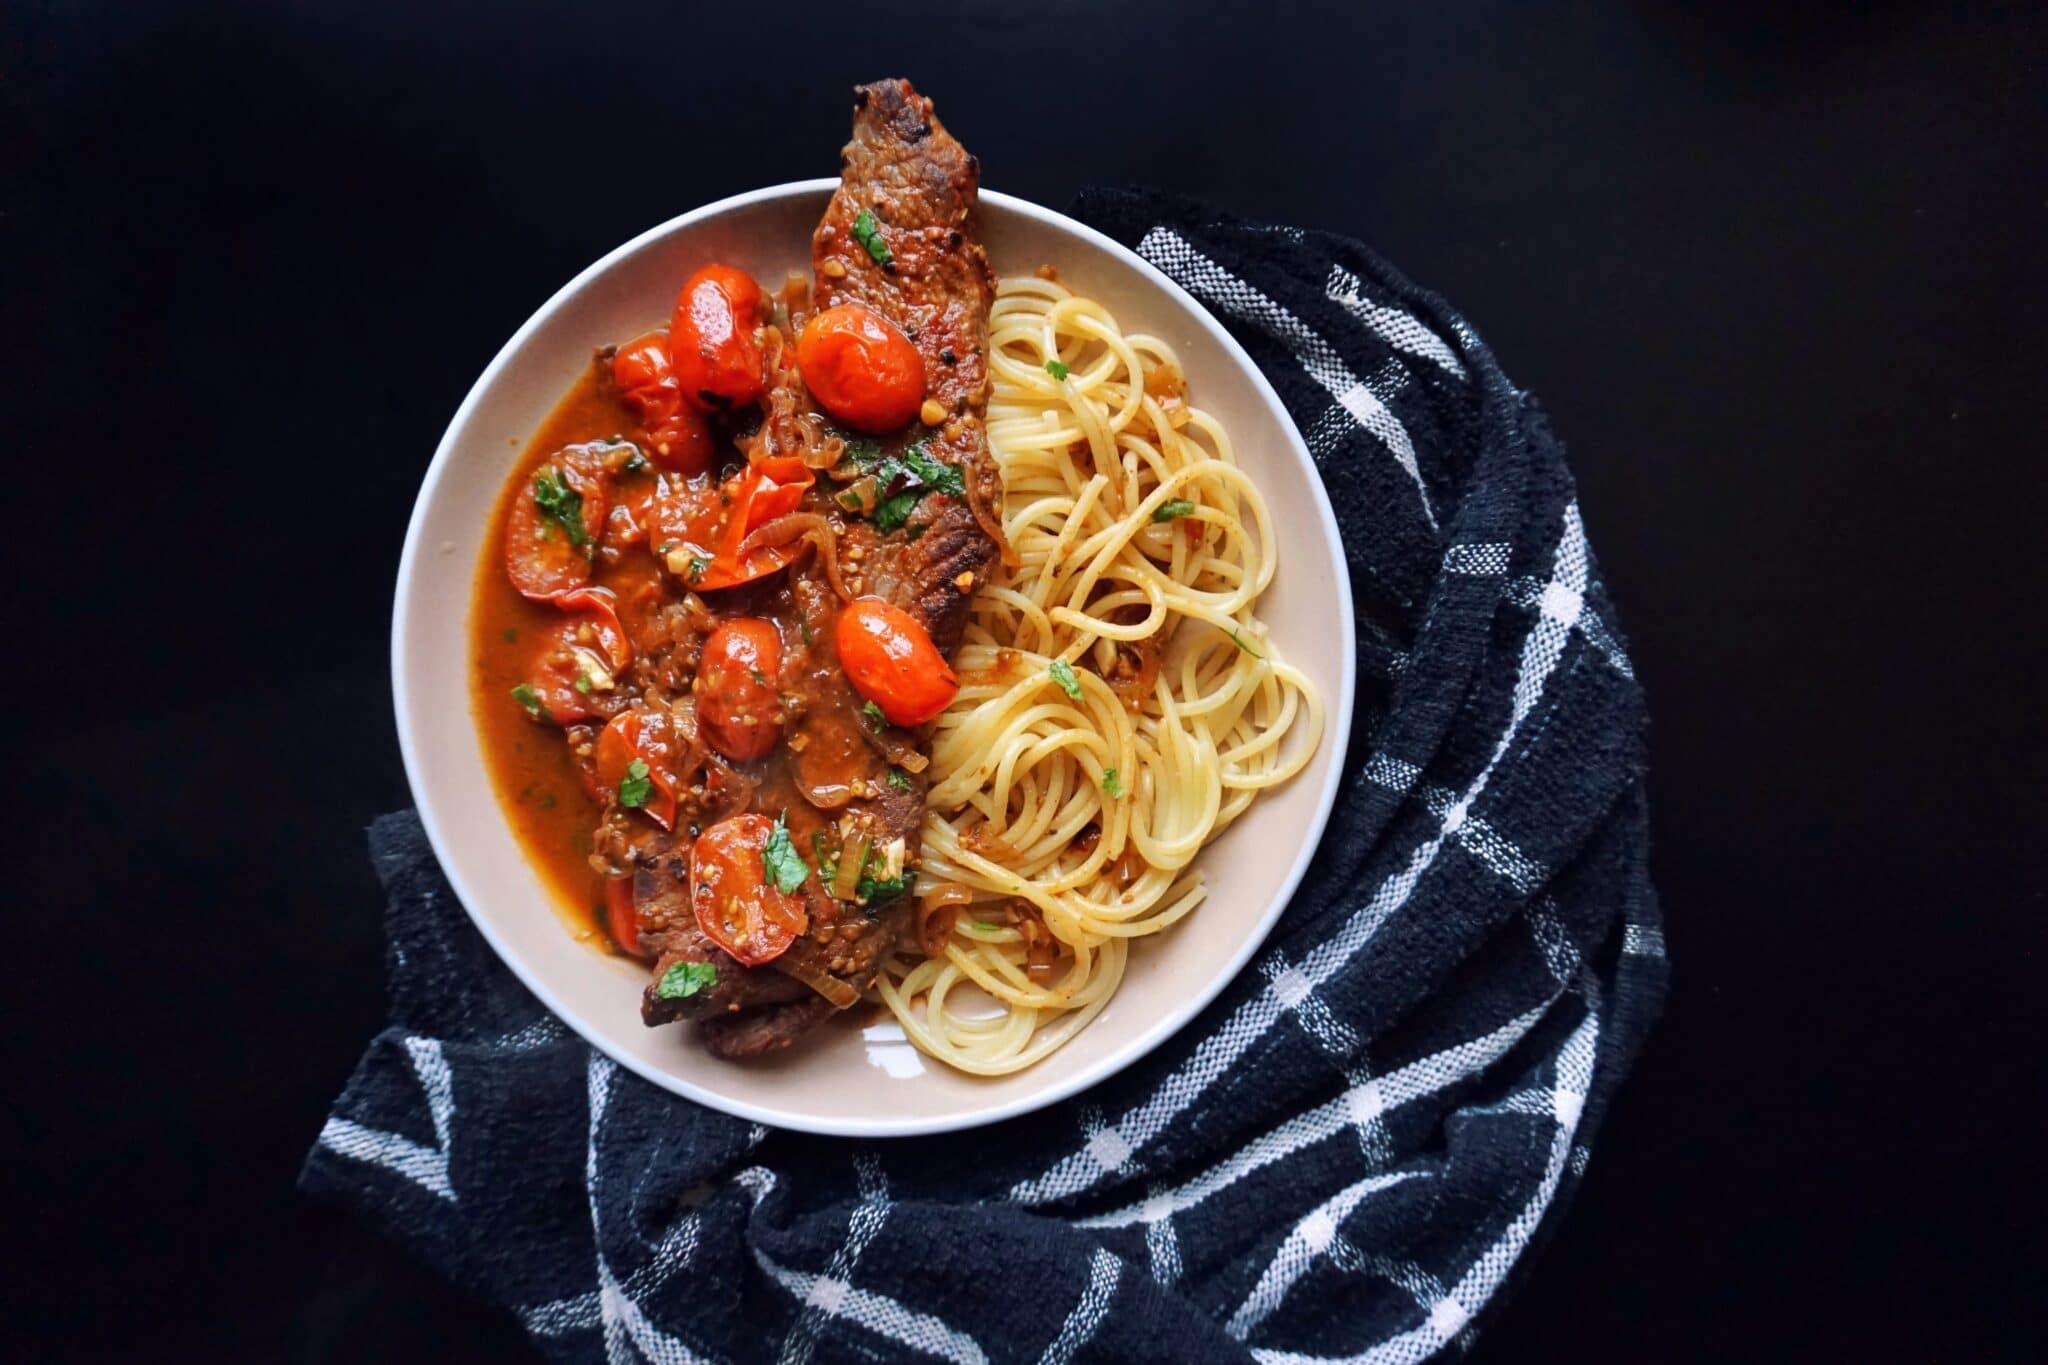 Easy Steak Recipe with Tomato Sauce